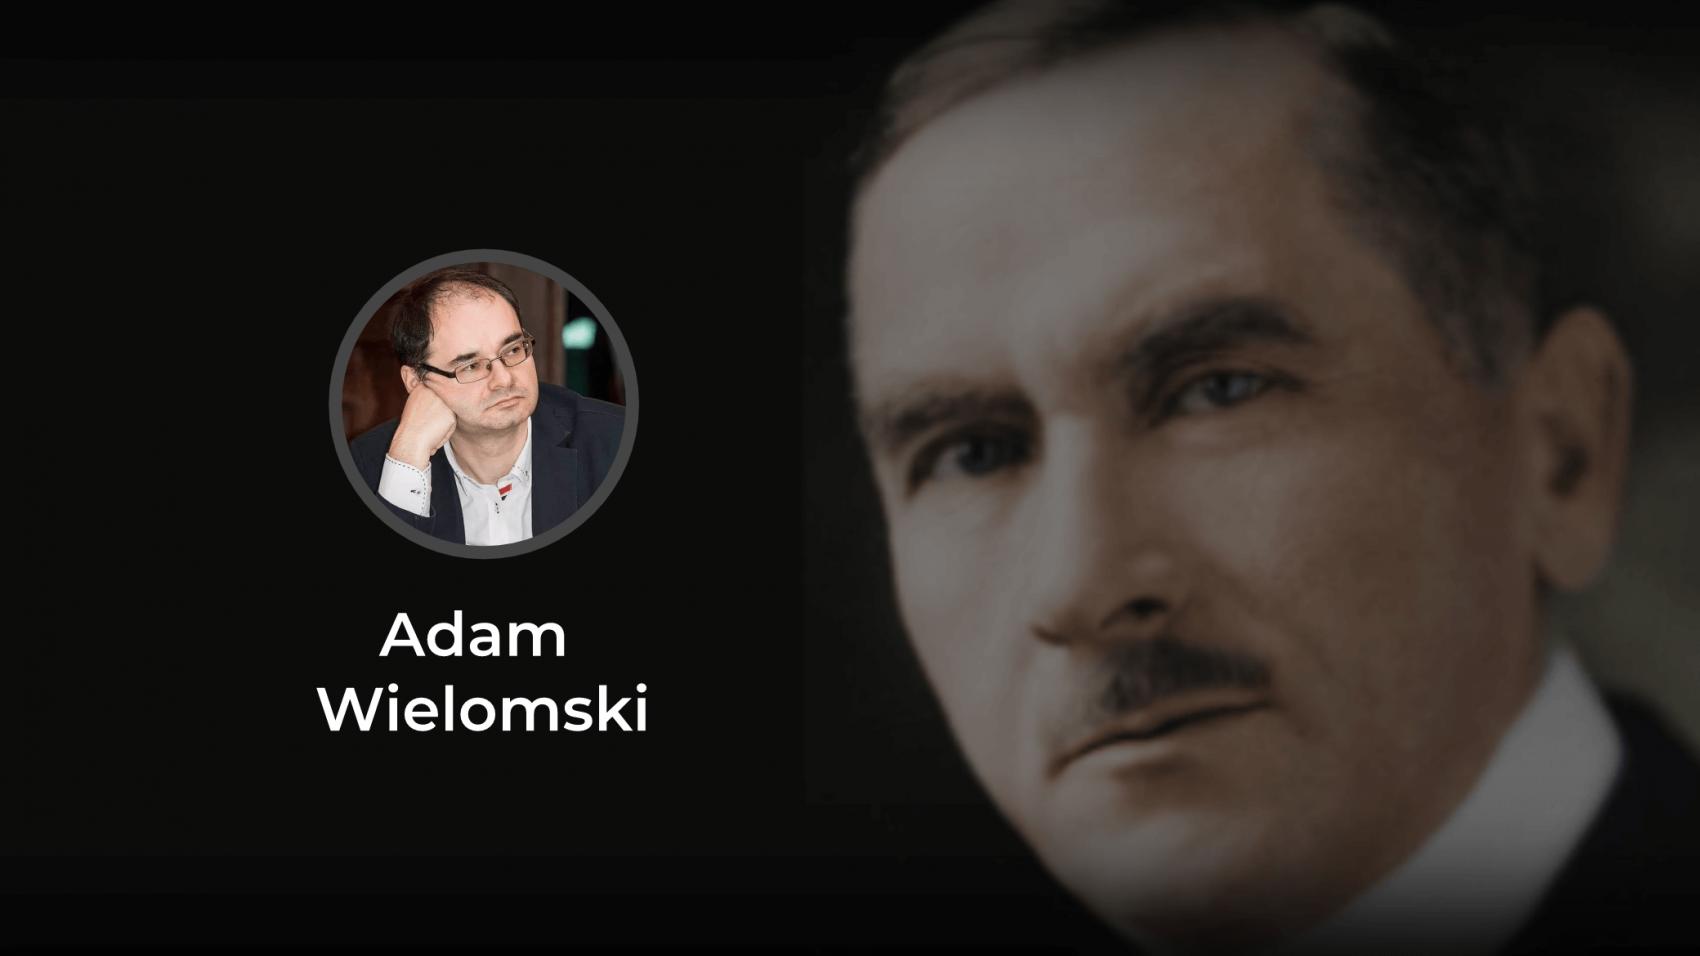 Adam Wielomski